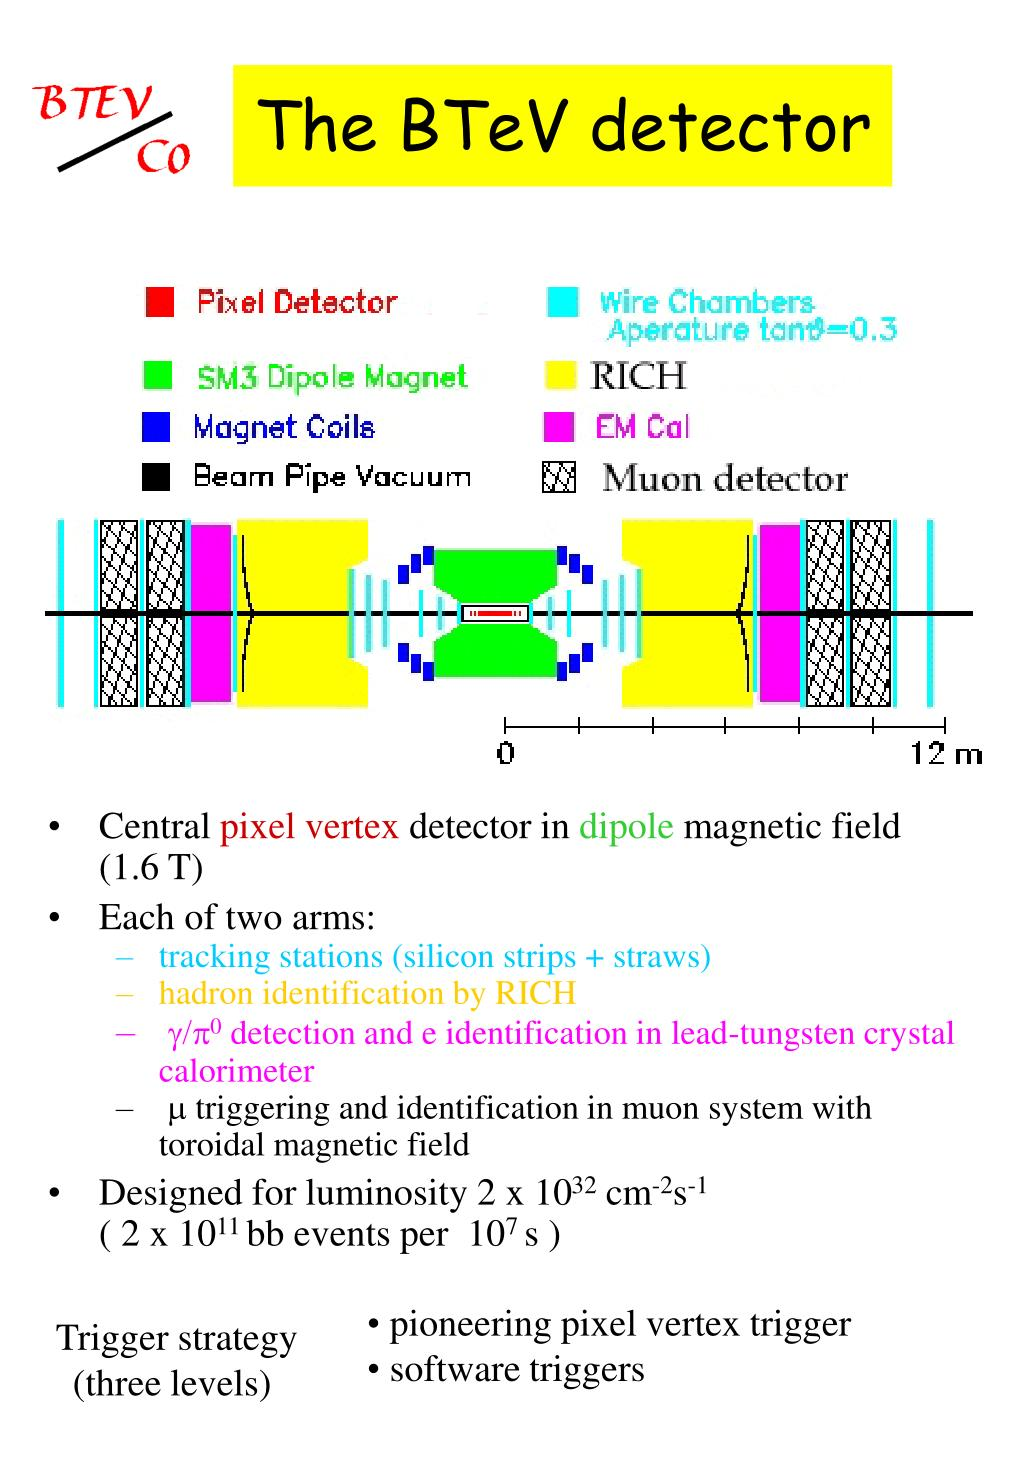 The BTeV detector